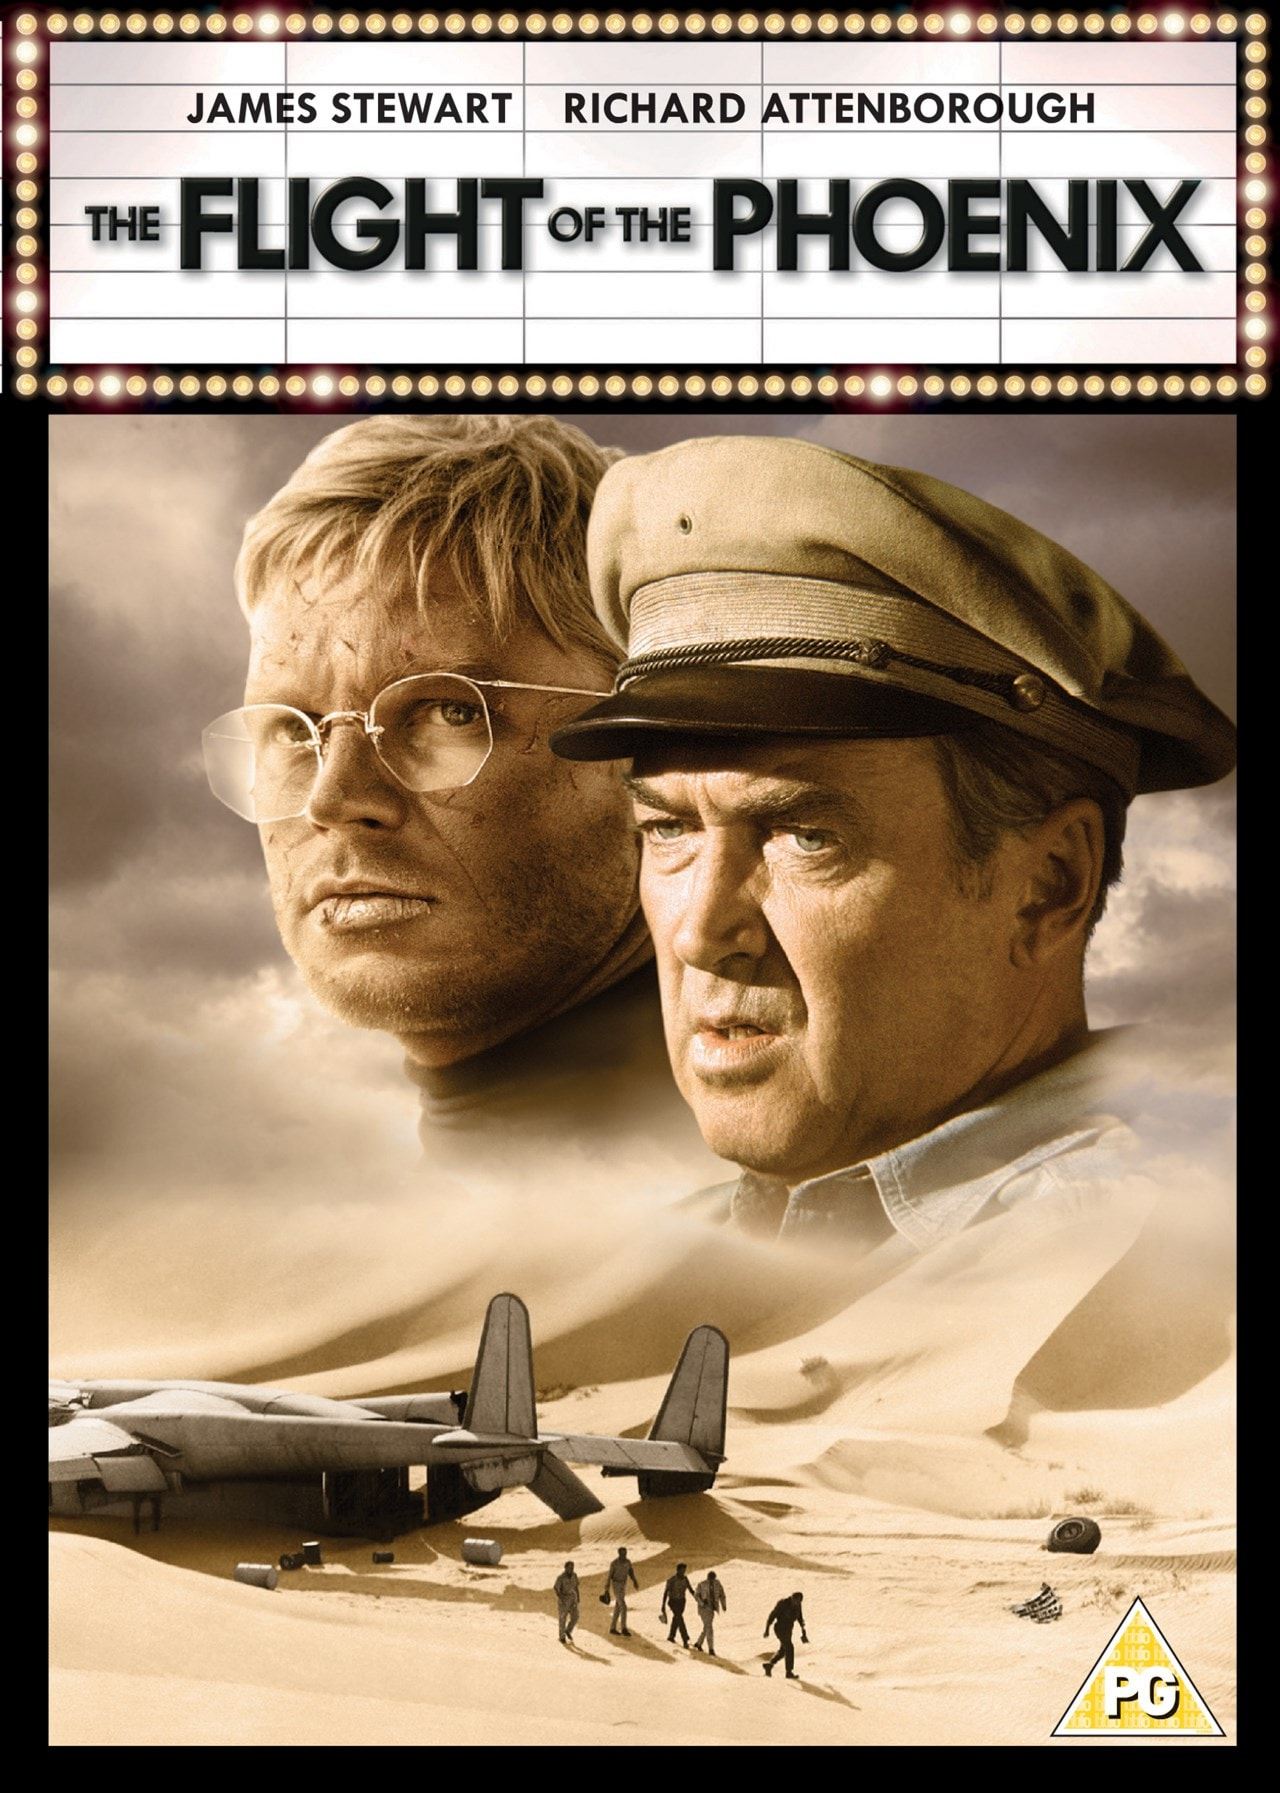 The Flight of the Phoenix - 1